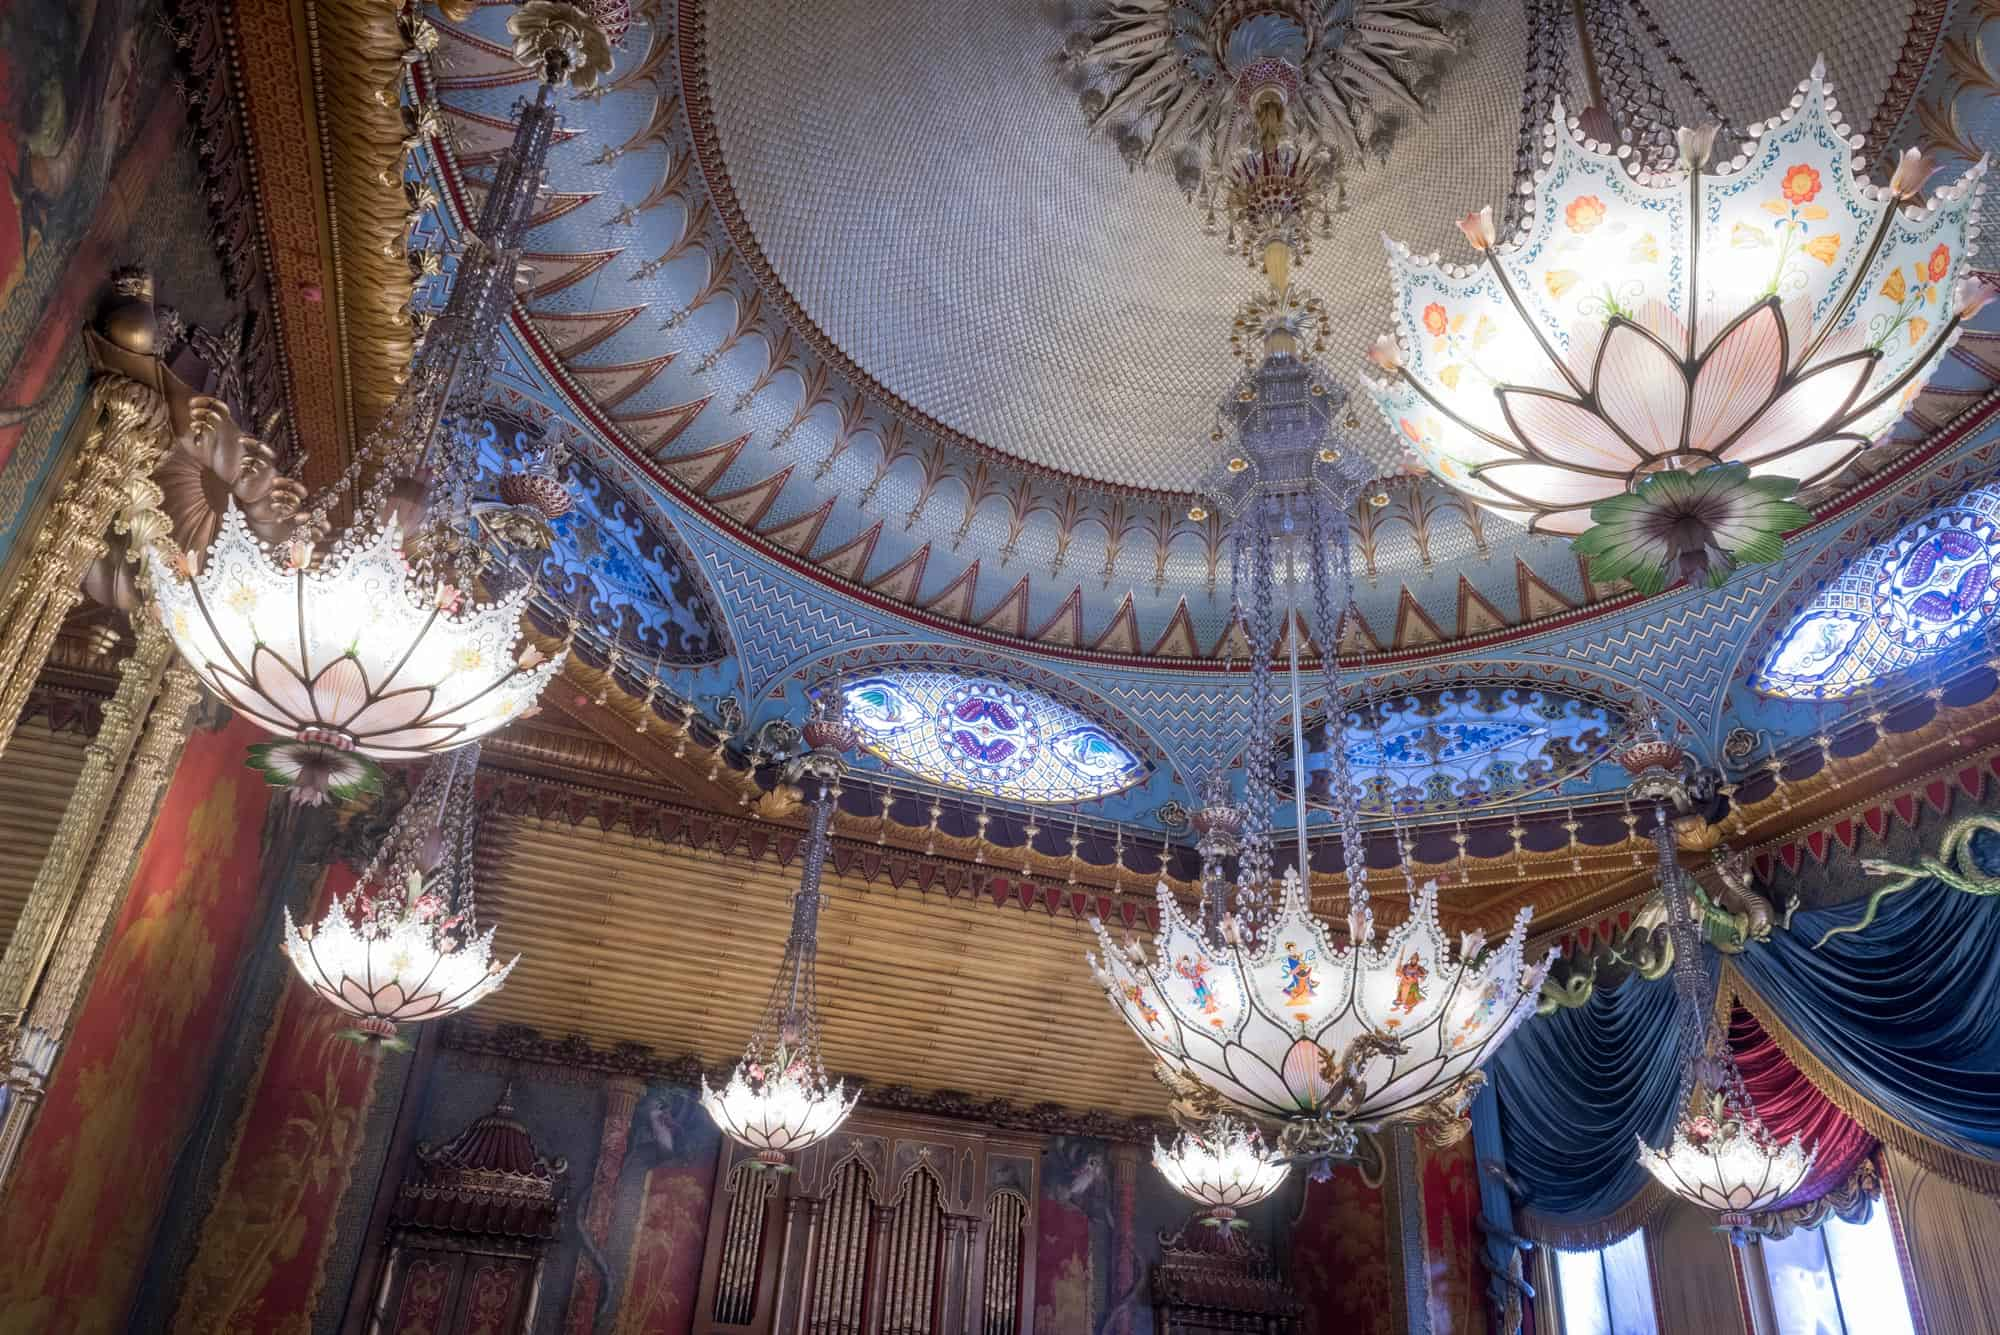 страны архитектура Королевский павильон Брайтон  № 2580690 бесплатно